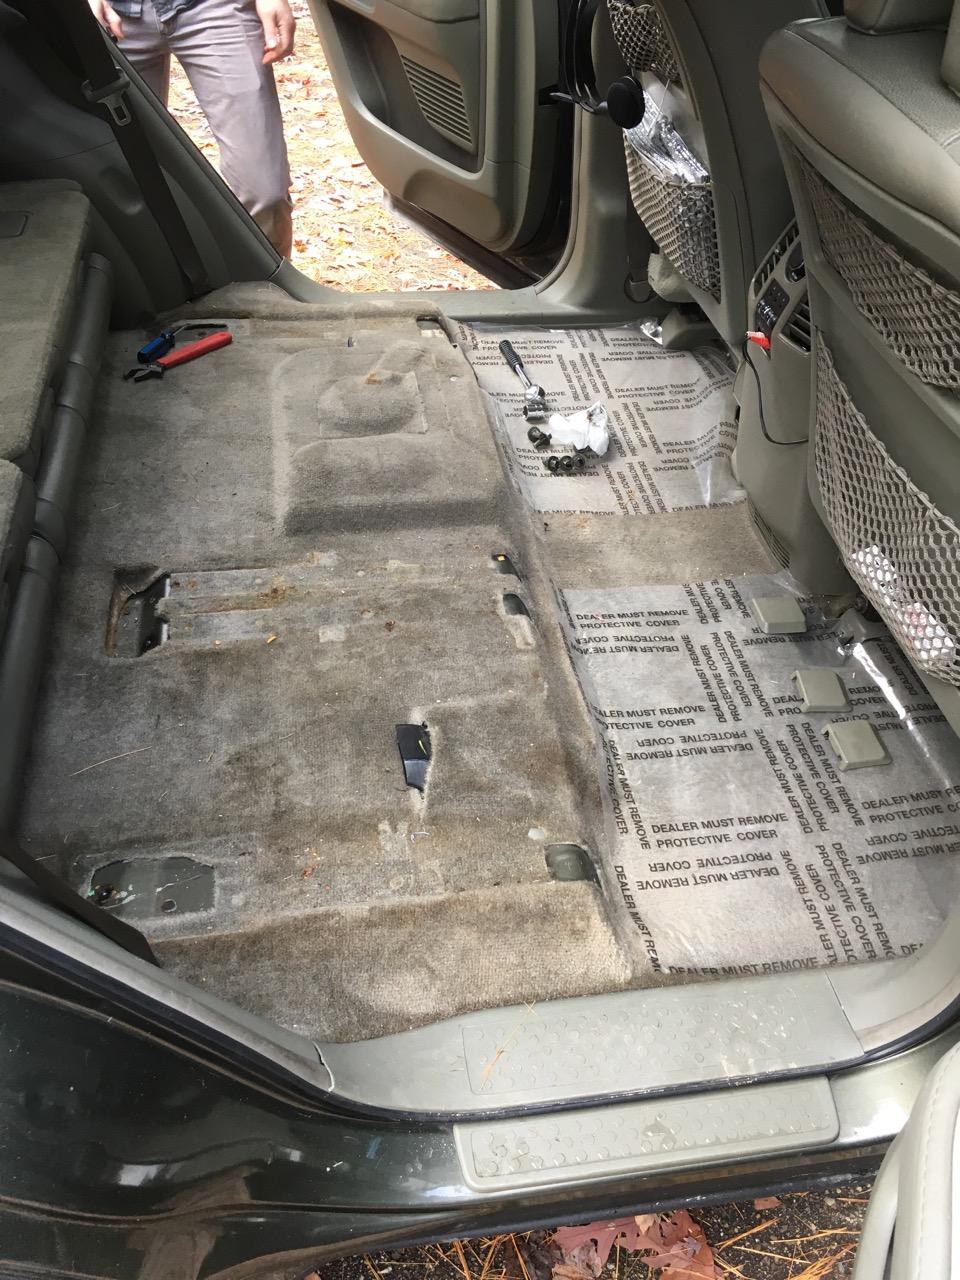 Removing second row seats? - Page 2 - Honda Pilot - Honda Pilot Forums